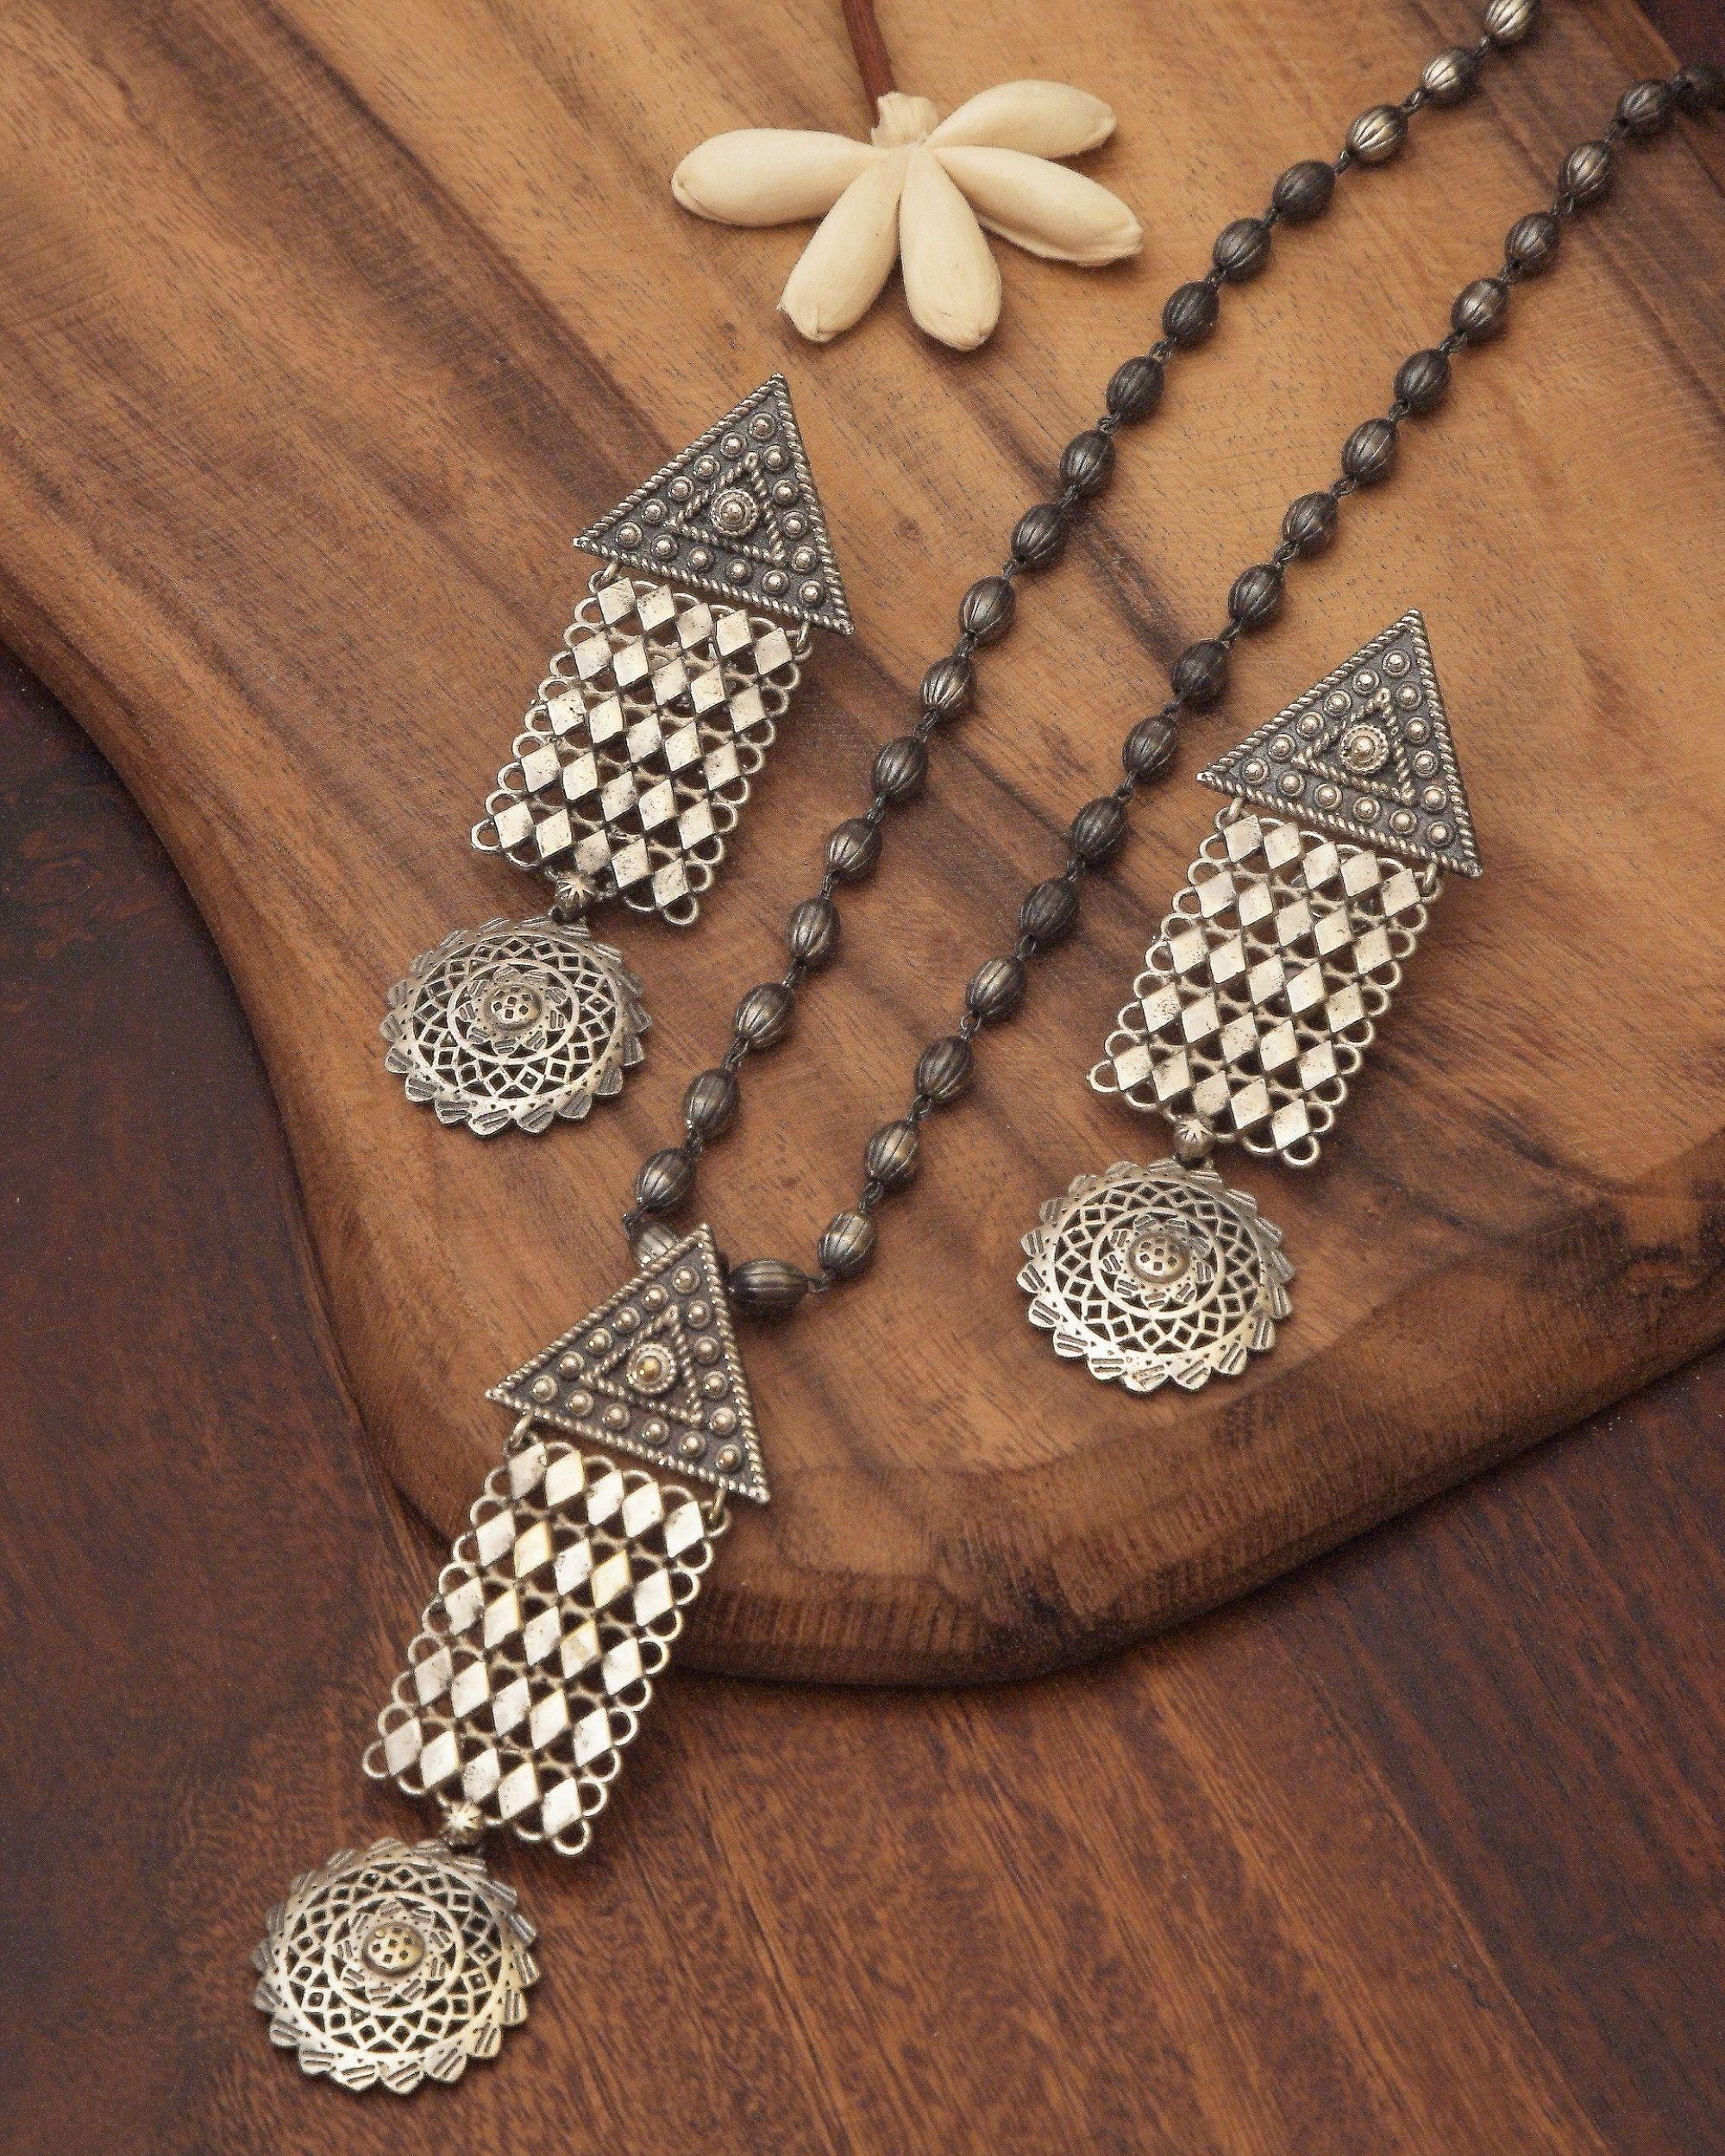 Geometric drop down jaal necklace & earrings - set of two